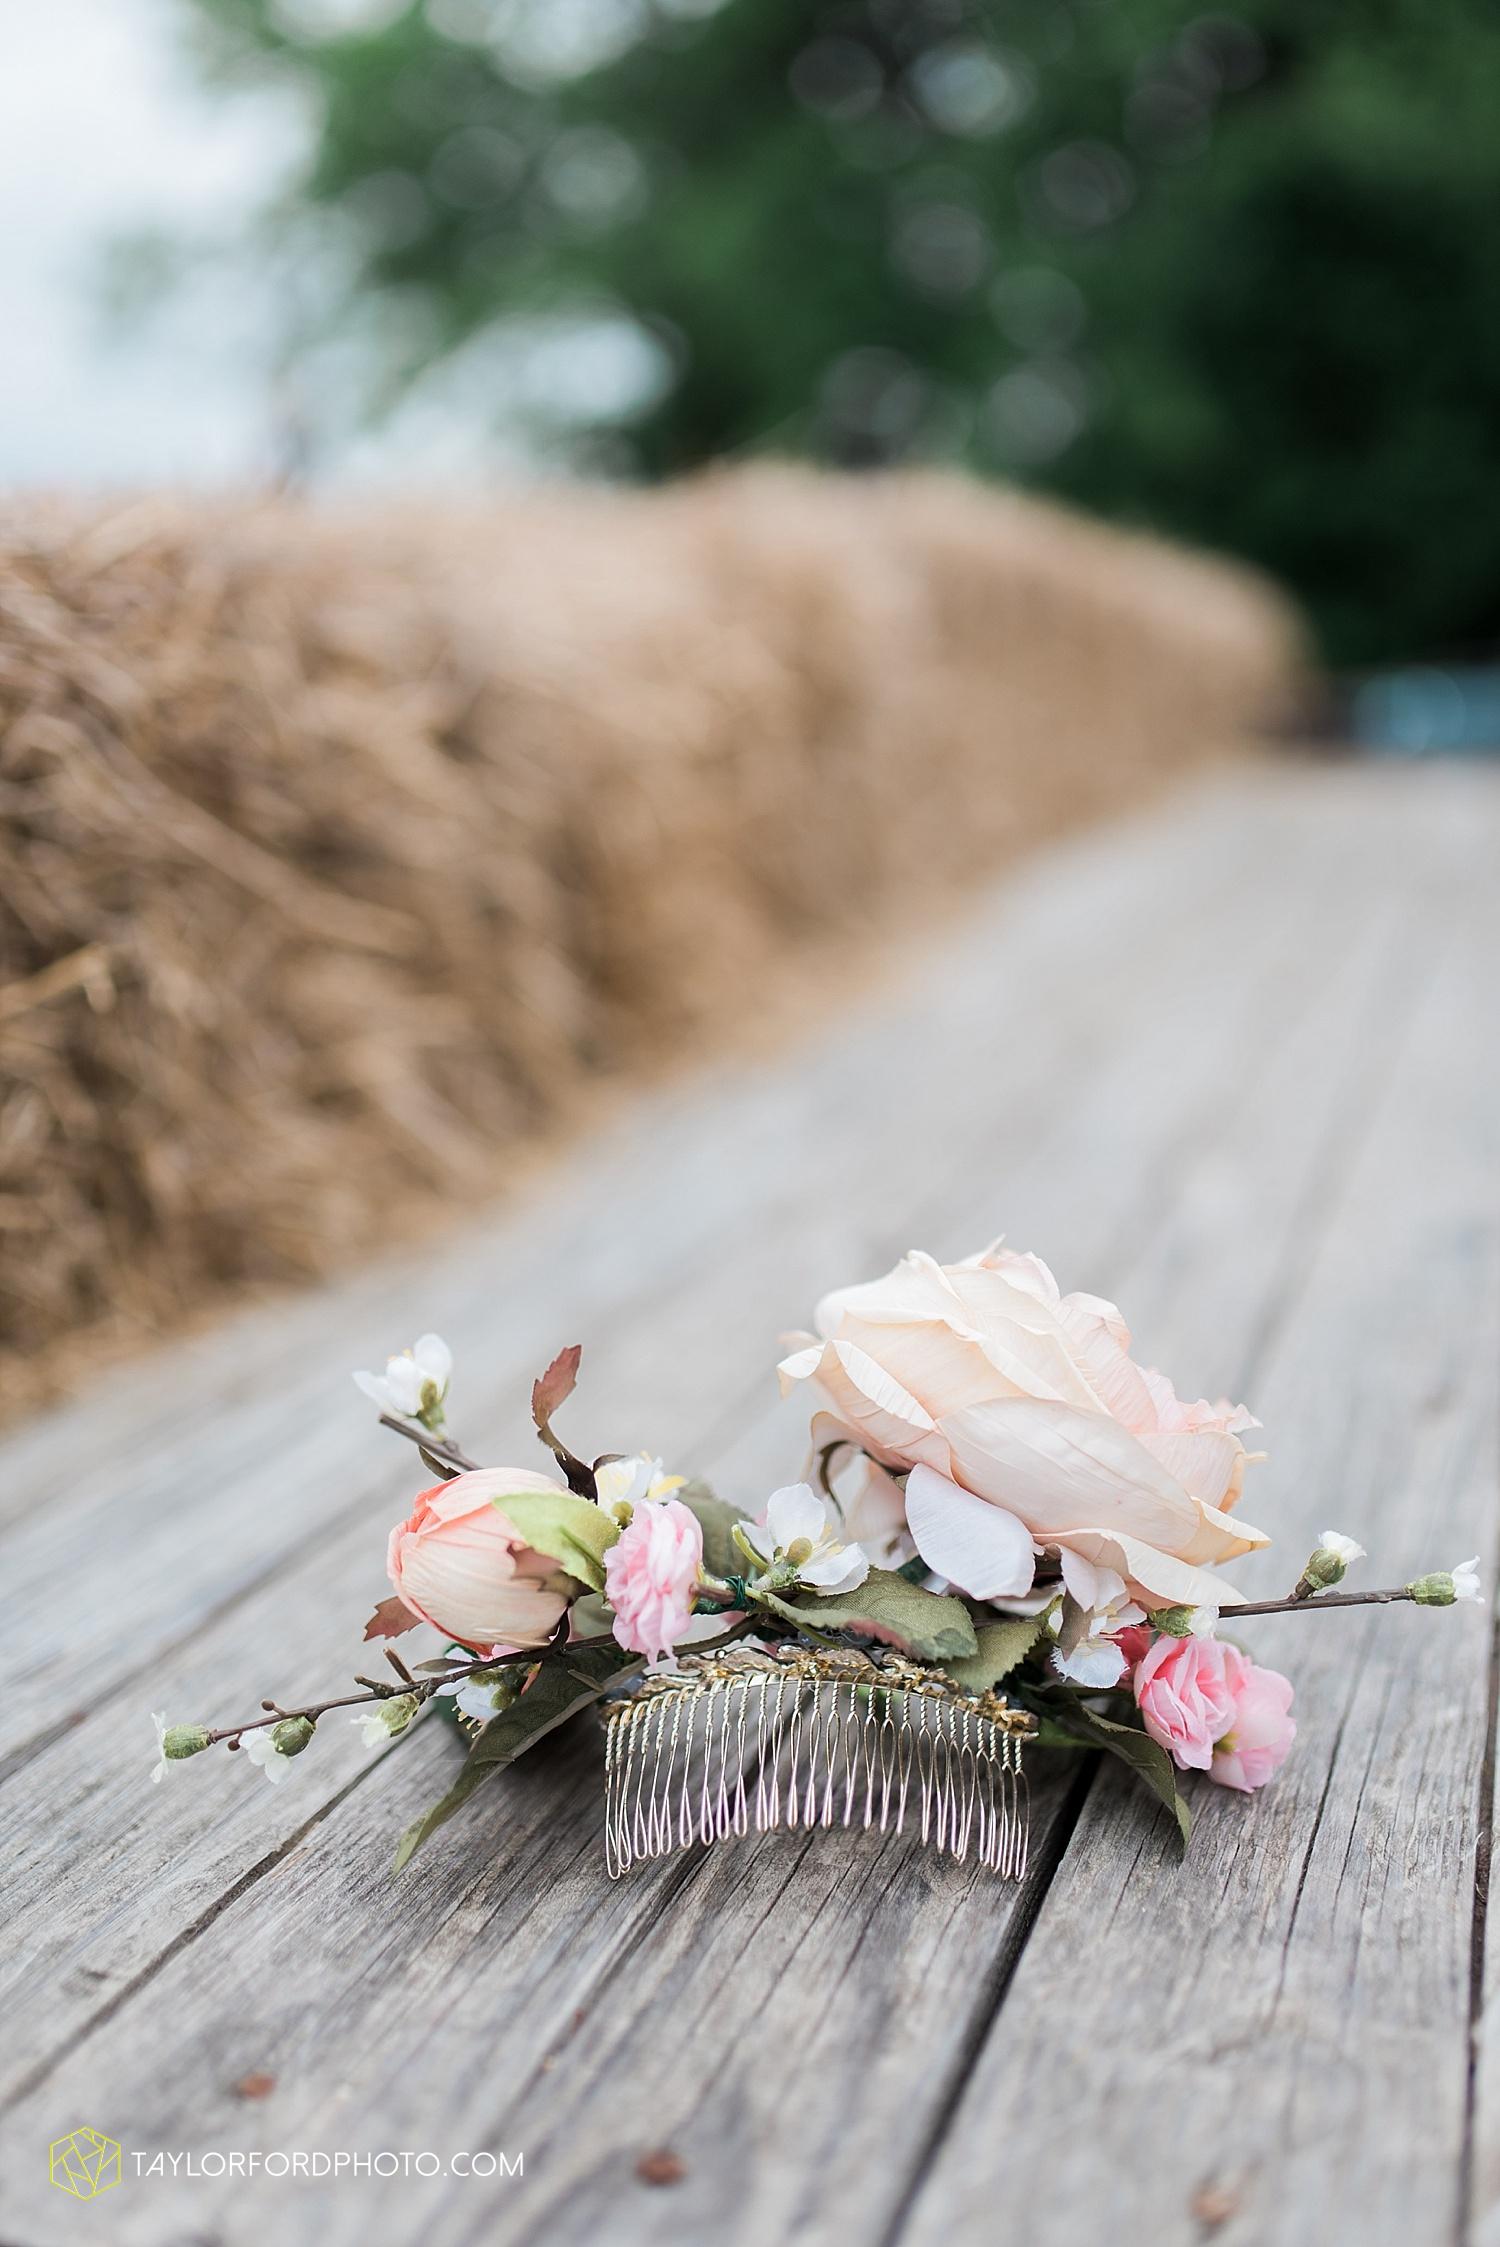 fort_wayne_indiana_wedding_photographer_taylor_ford_marian_hills_farm_0191.jpg